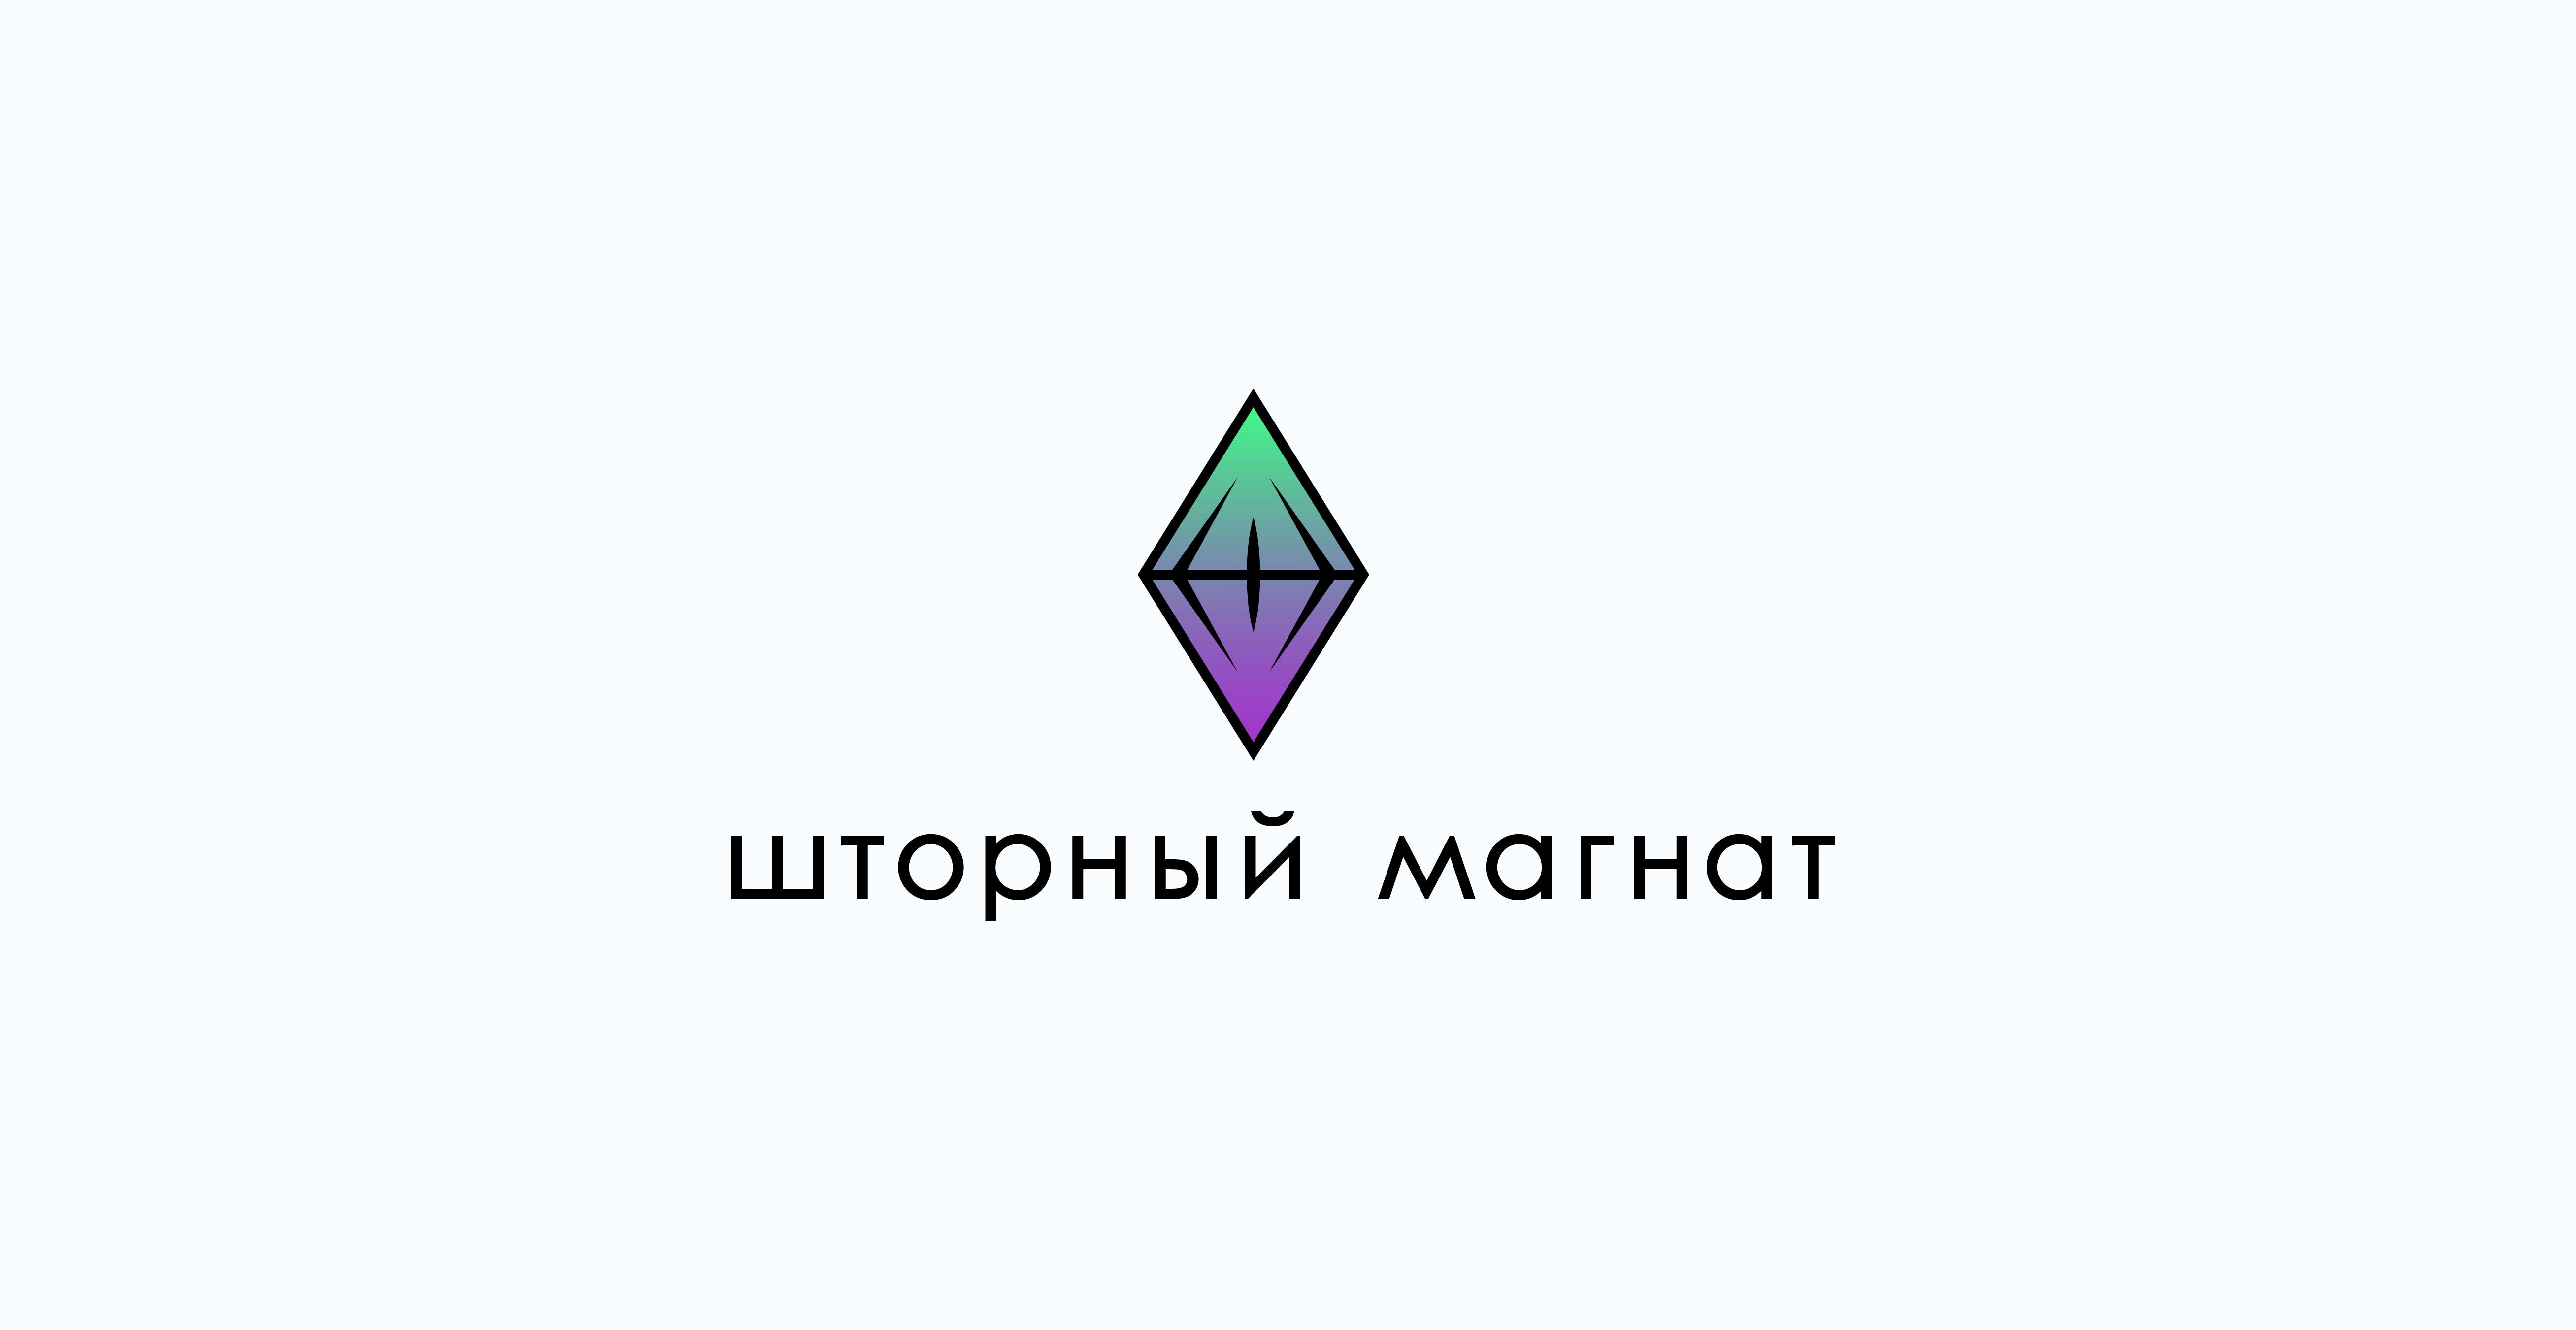 Логотип и фирменный стиль для магазина тканей. фото f_0765cd9e81709e41.jpg